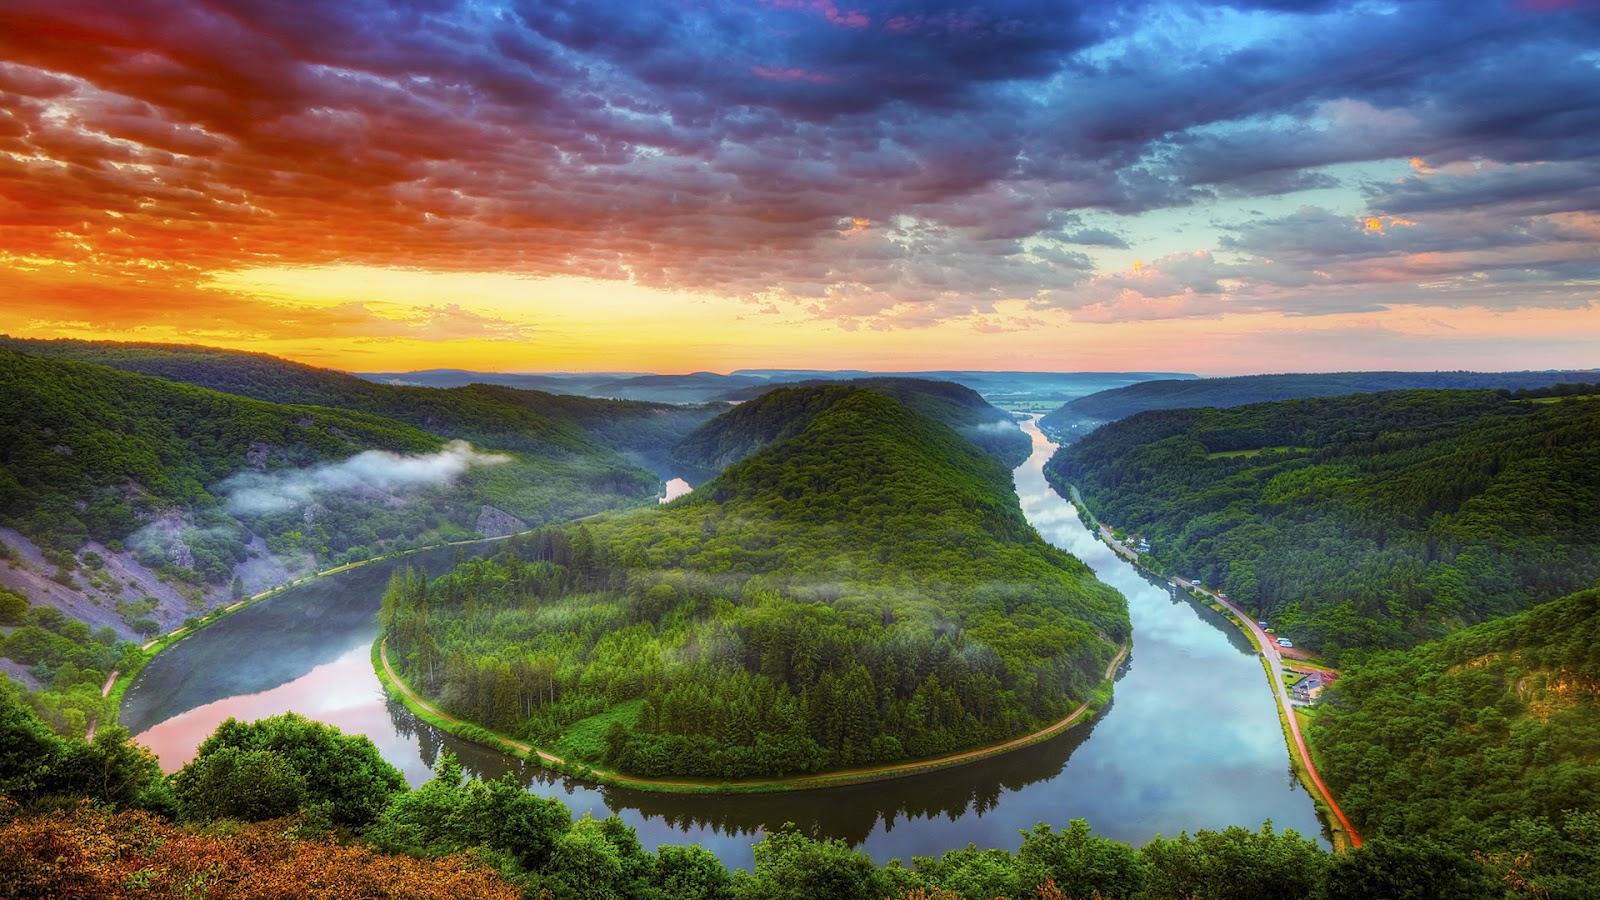 Wonderful Nature Hd Wallpaper: Beautiful HD Wallpapers Nature